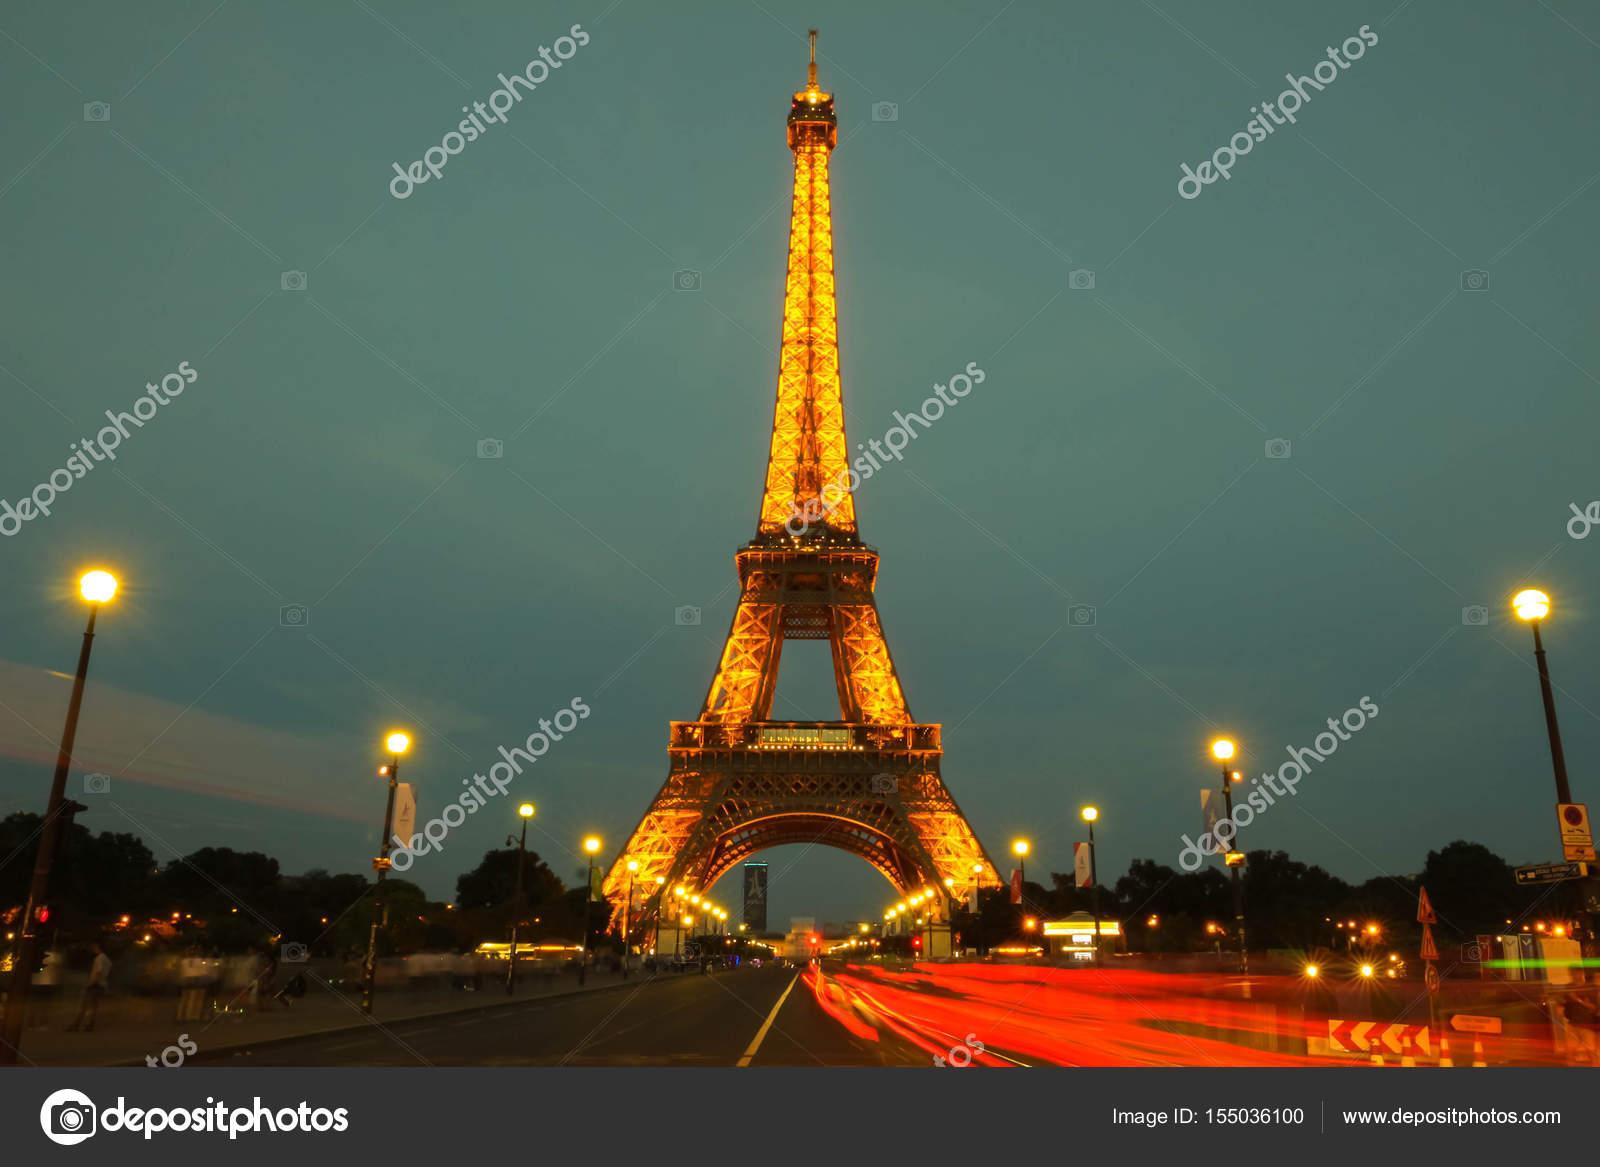 Fotos De Torre Eiffel Tour Paris Francia Iluminada